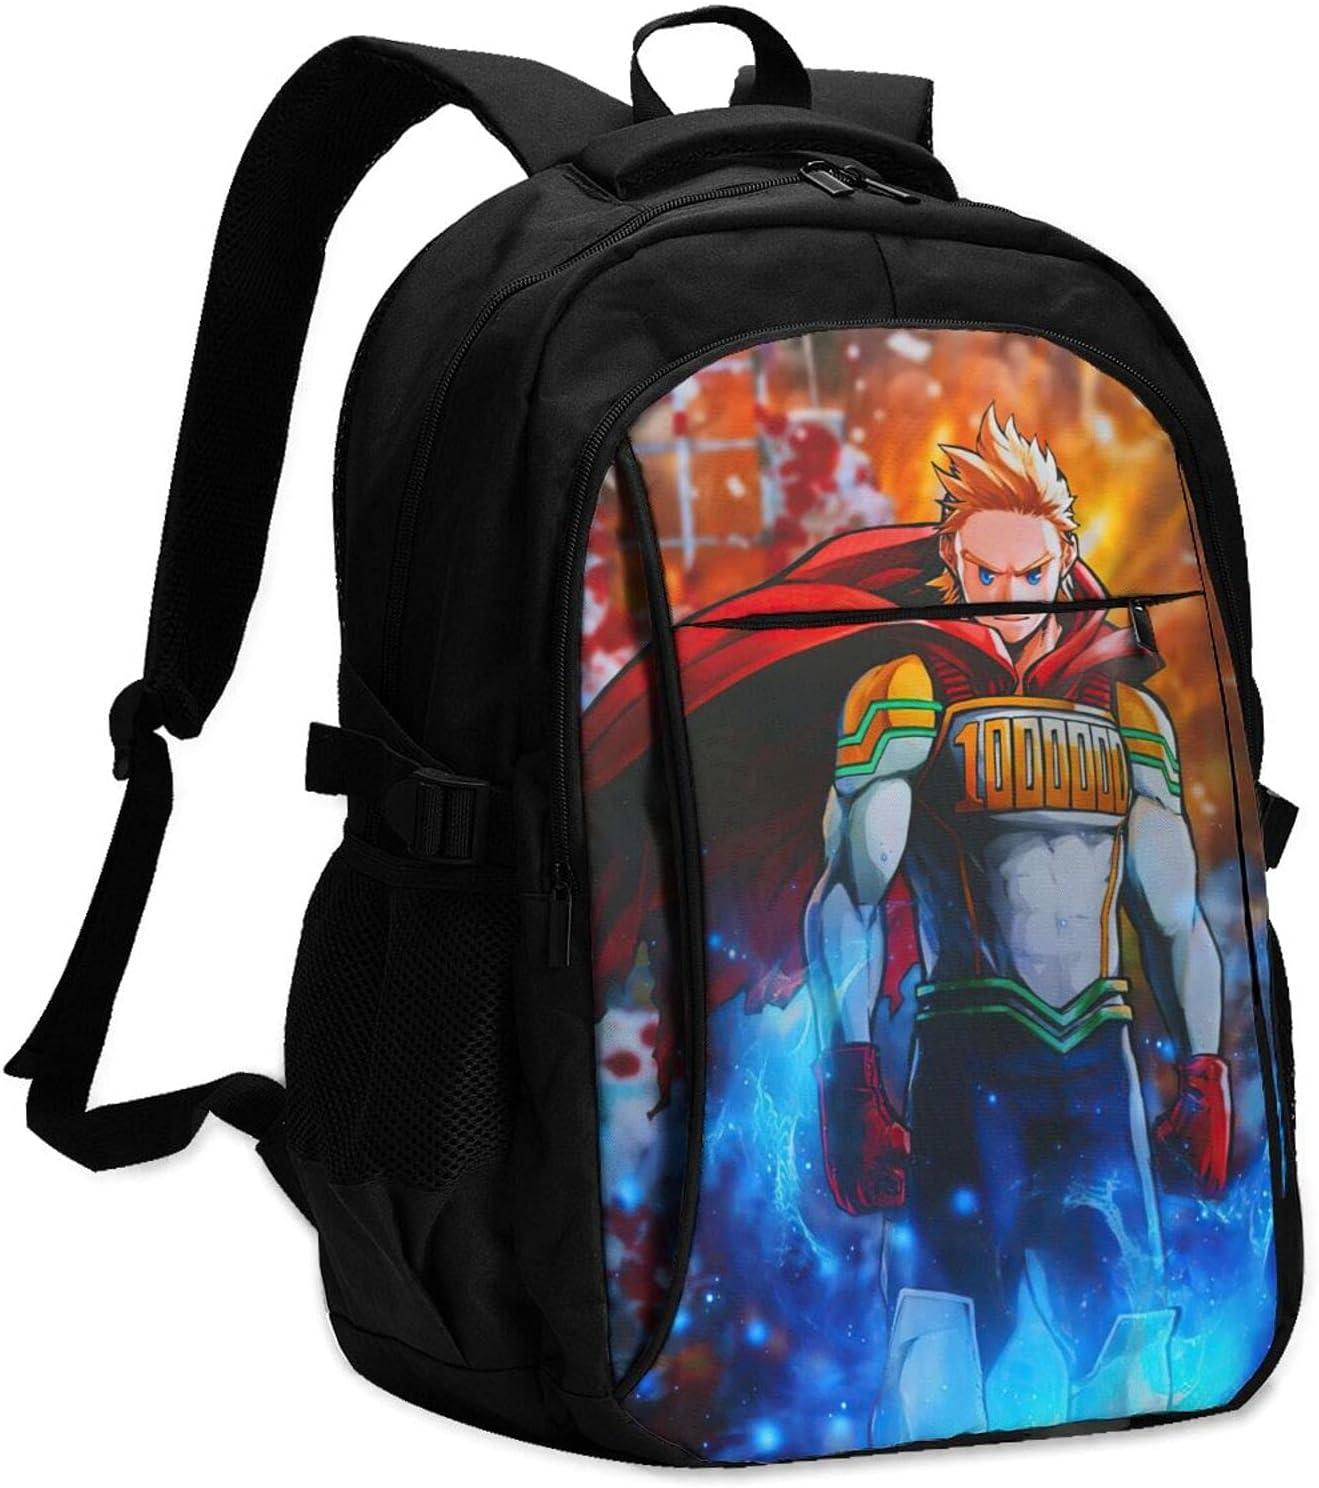 Mirio Togata Brand Cheap Sale Venue Lemillion My Hero Academia 2021 model Bac Cartoon Anime Travel